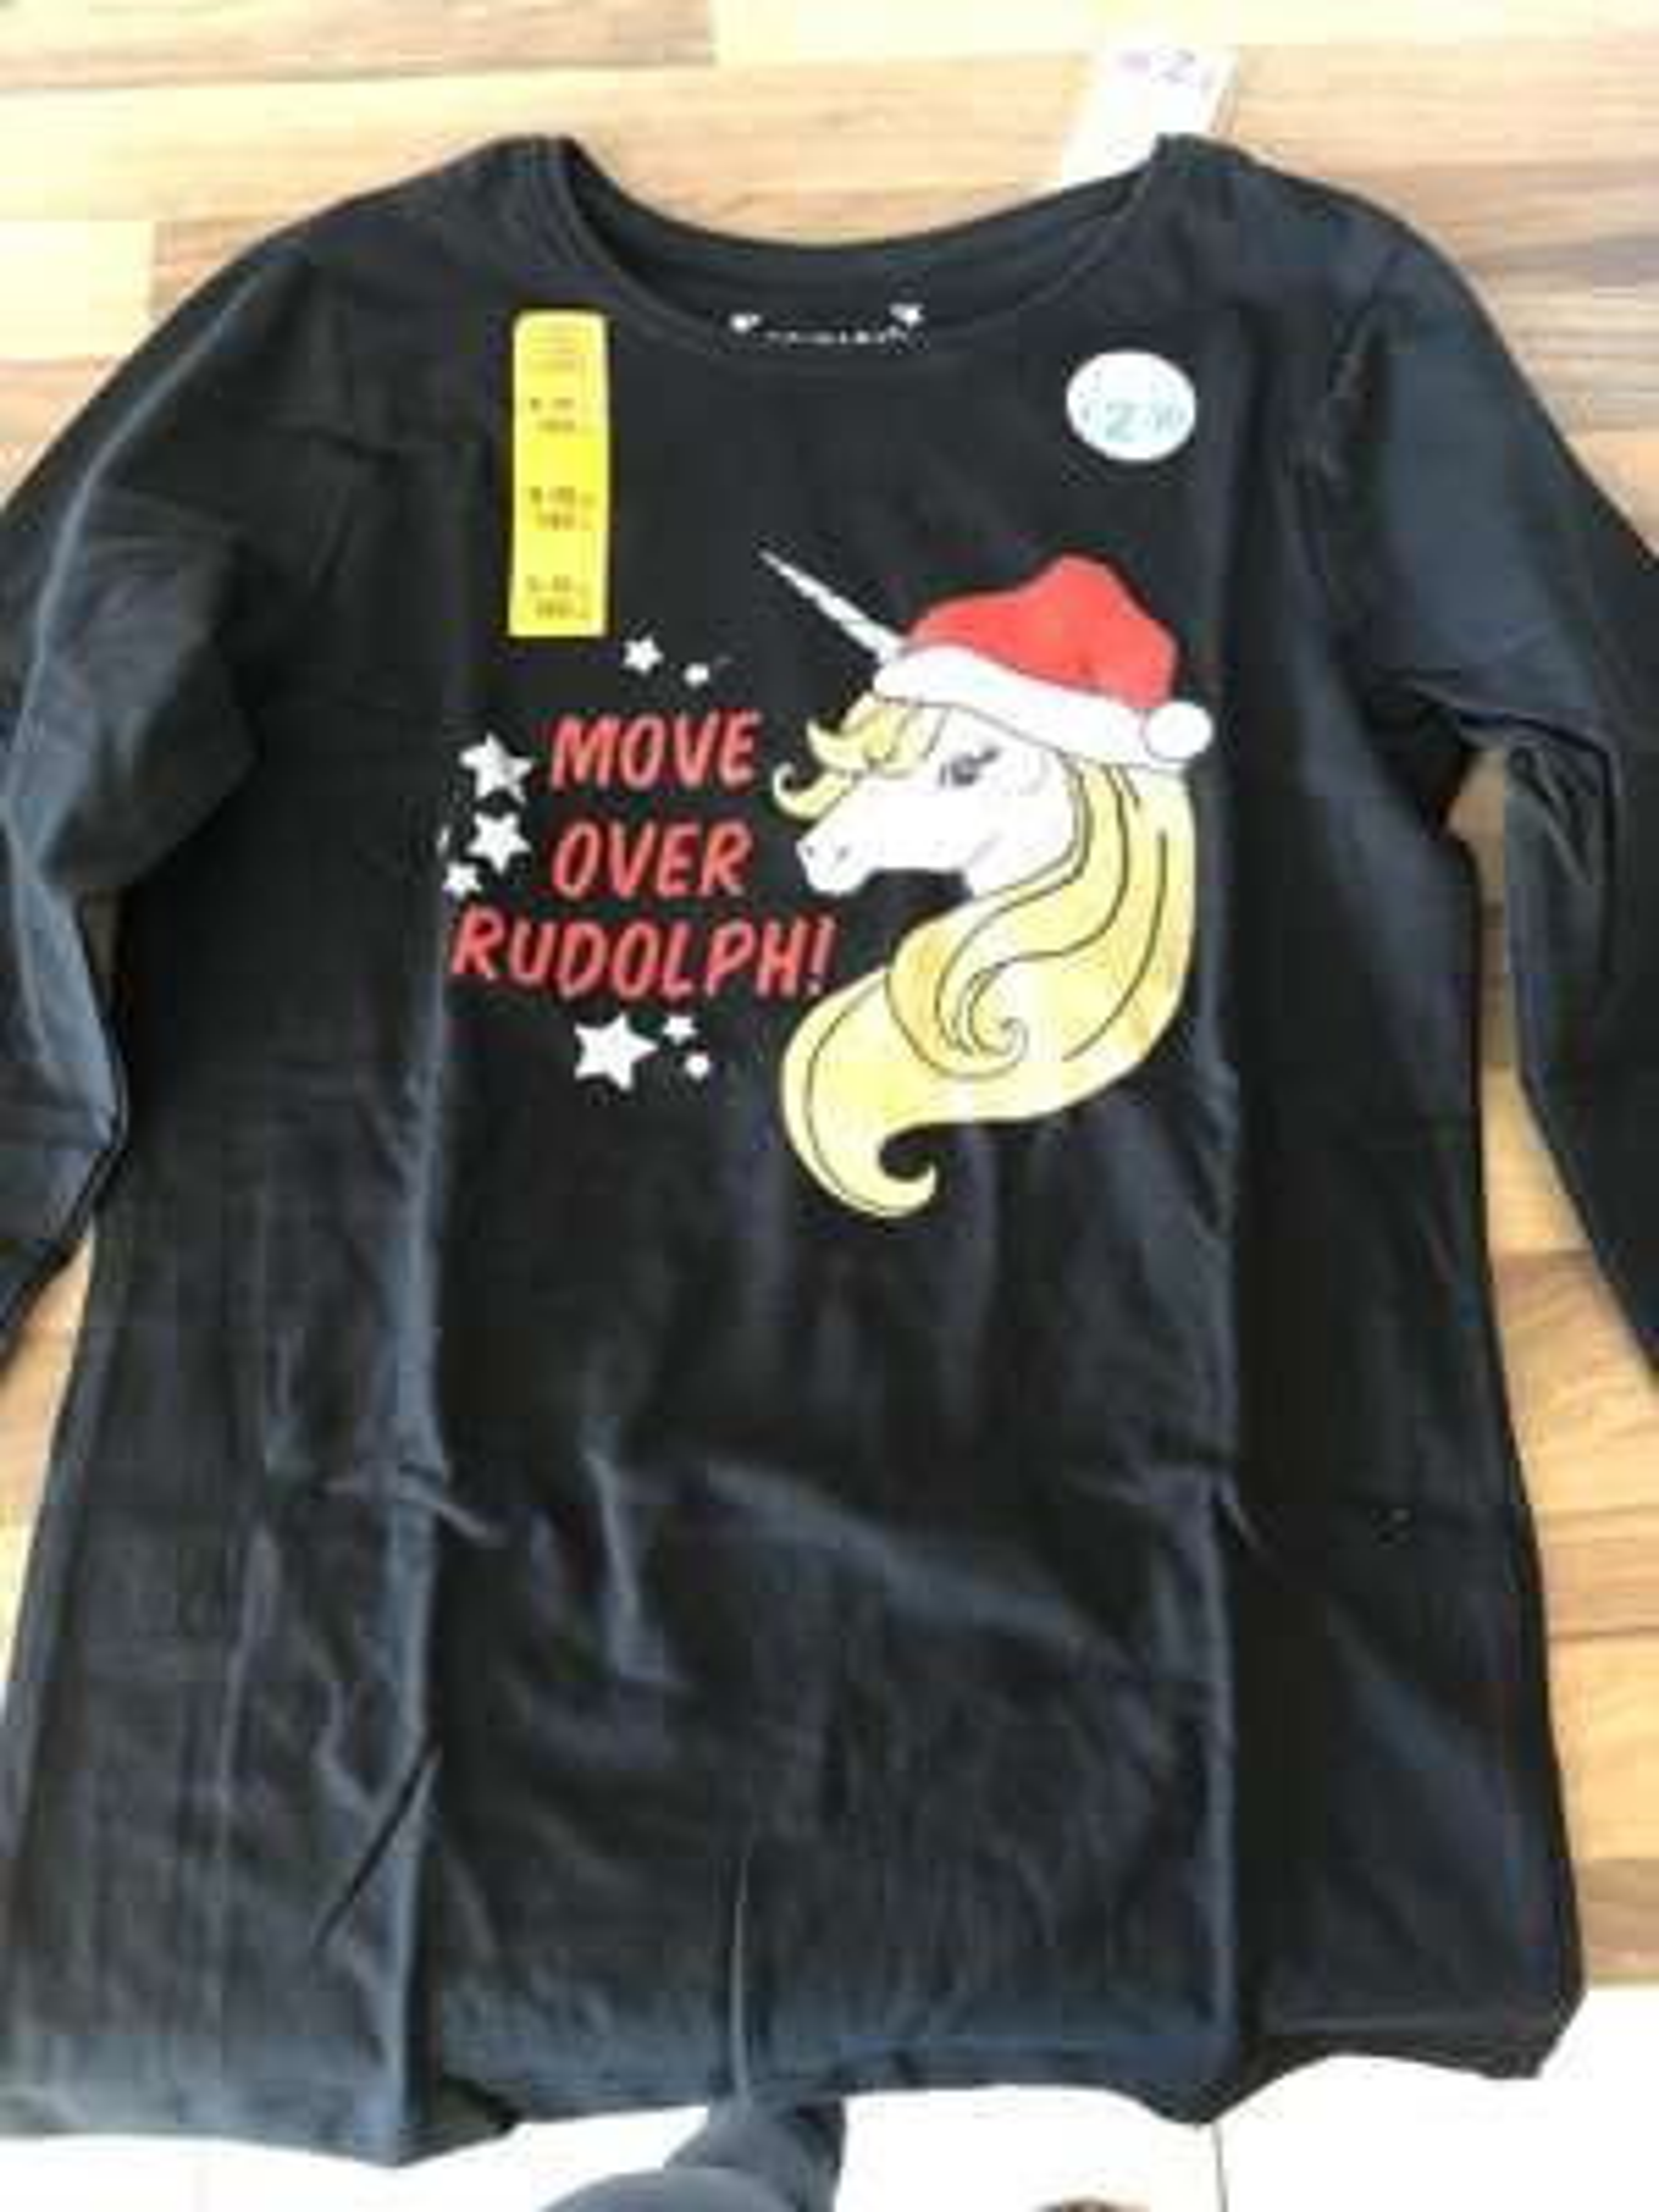 Girls unicorn, (move over rudolph) christmas tshirt £2.30 primark